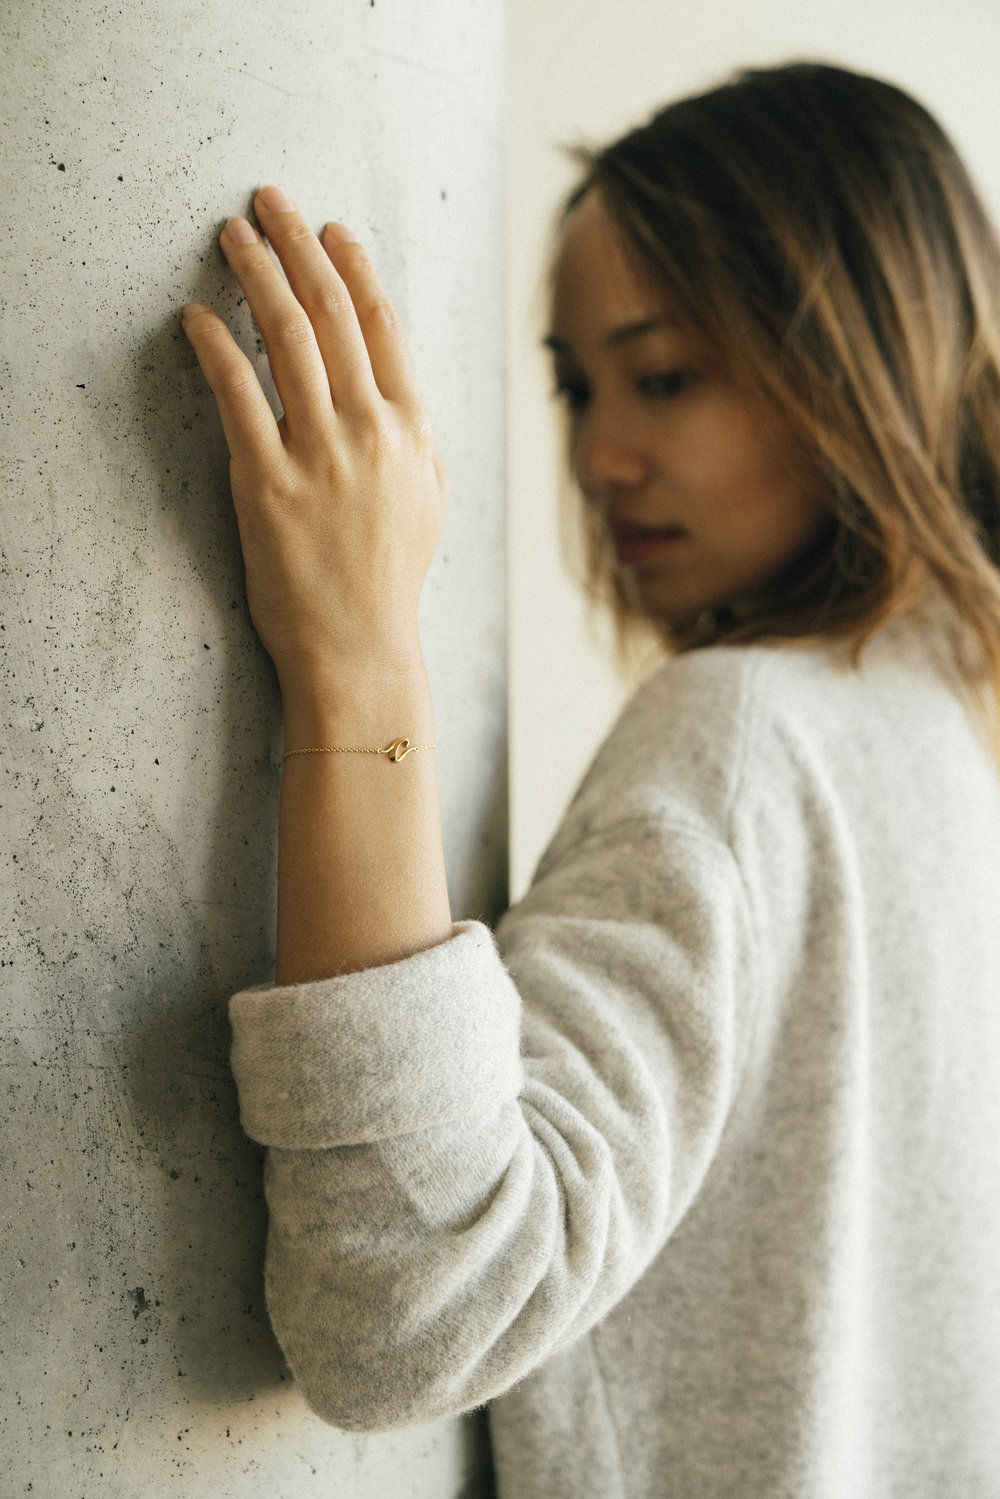 hey-yeh-joyce-chiang-calligraphy-bracelet-01S.jpg